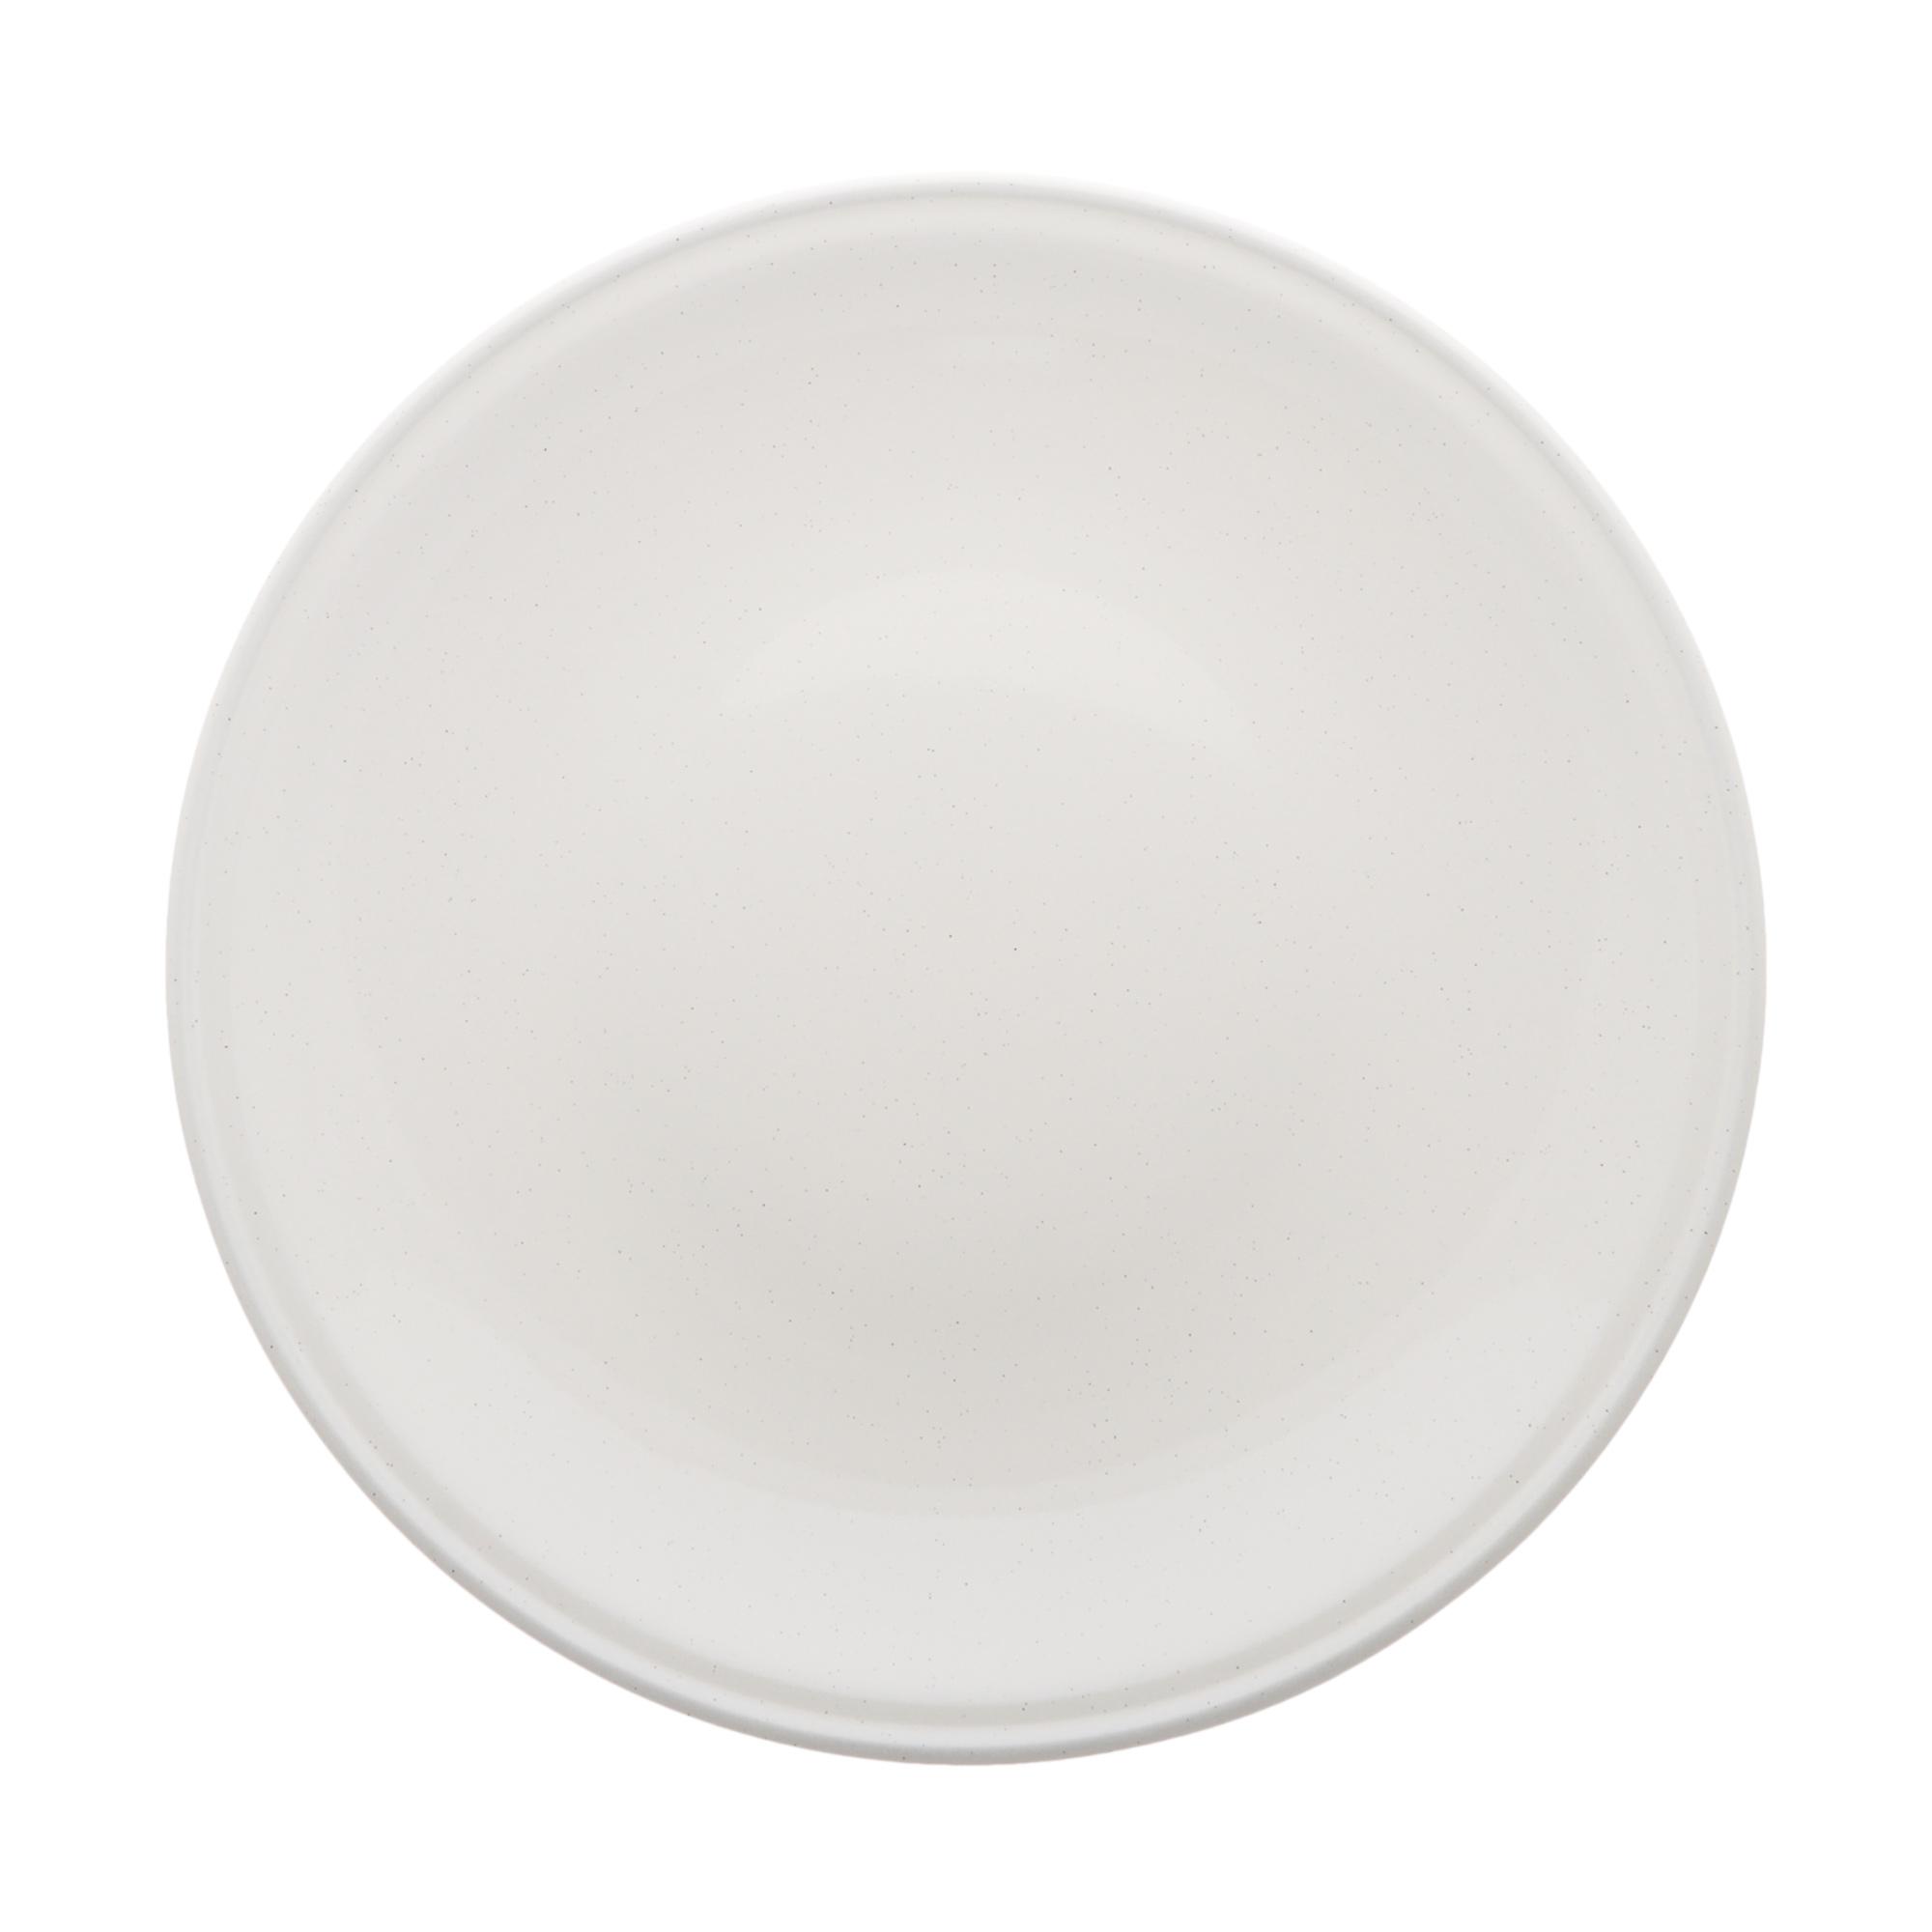 Тарелка обеденная 26см Tognana Siena белая фото